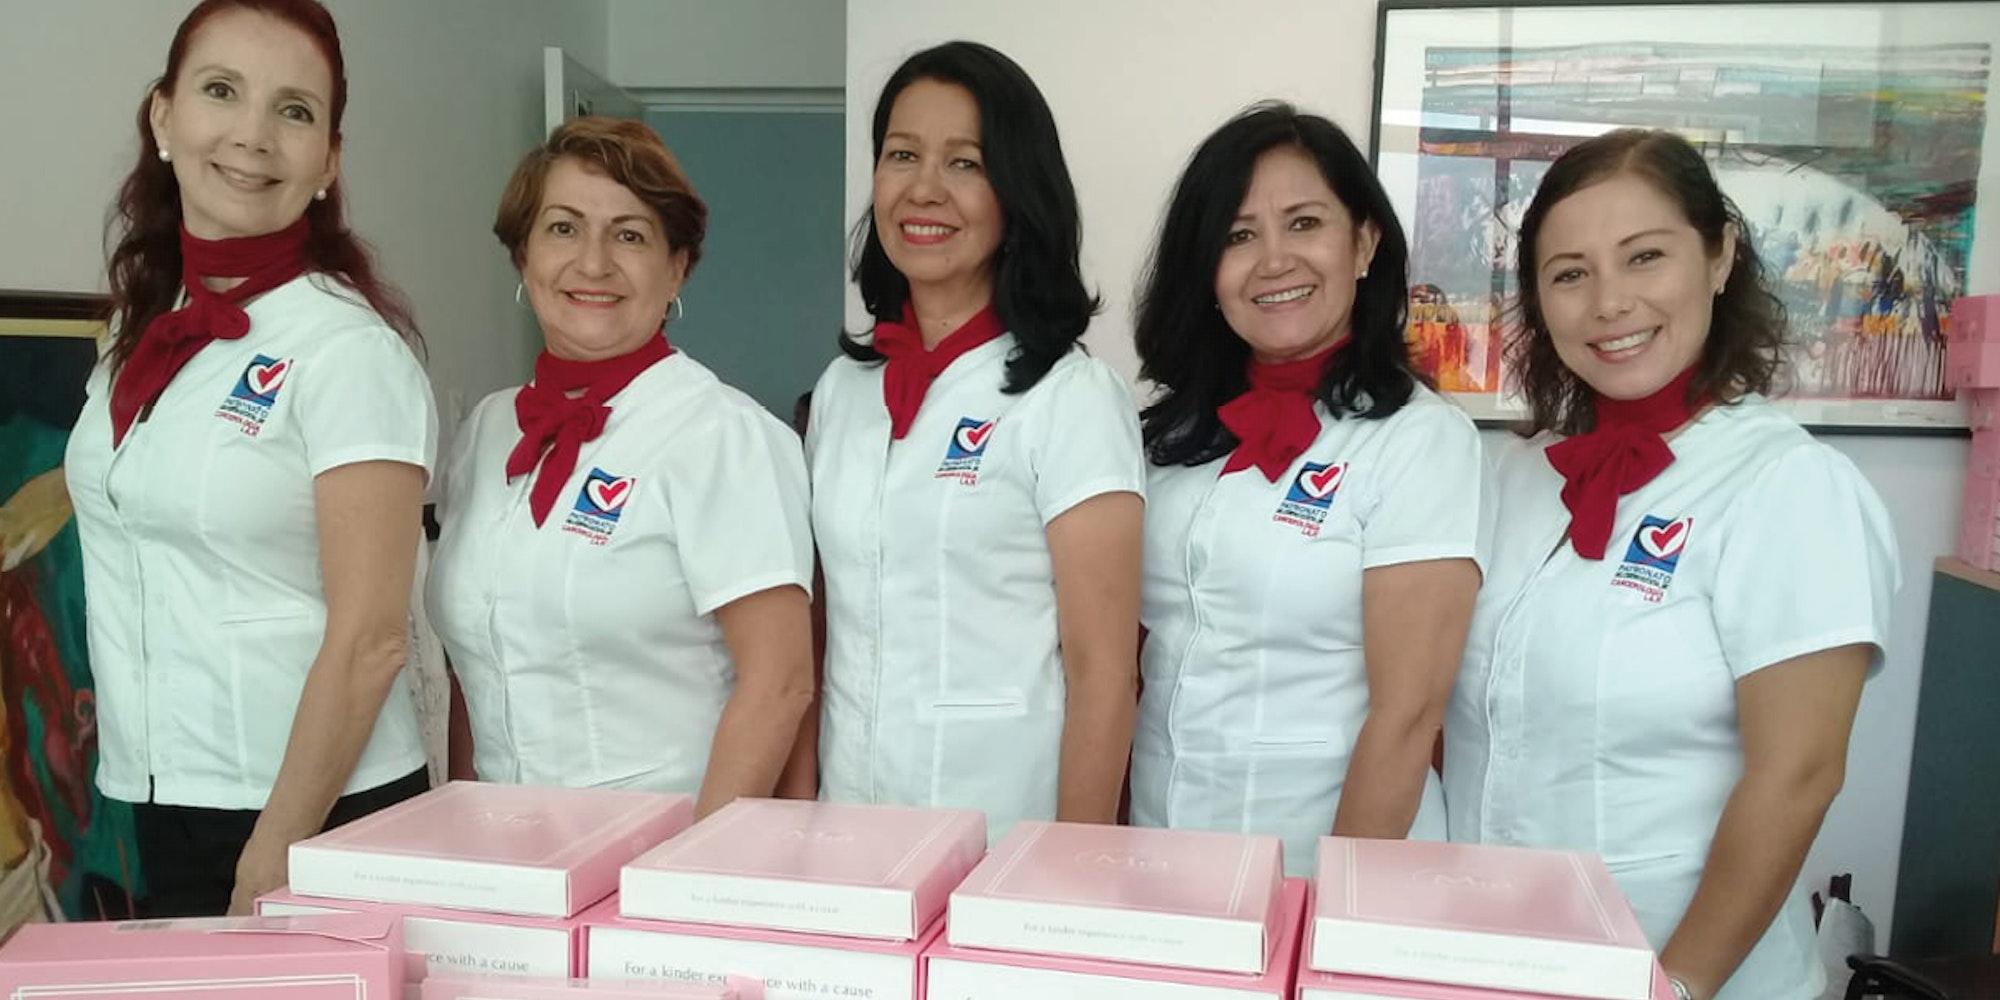 Cover Image for Patronato hace entrega de material a pacientes con linfedema